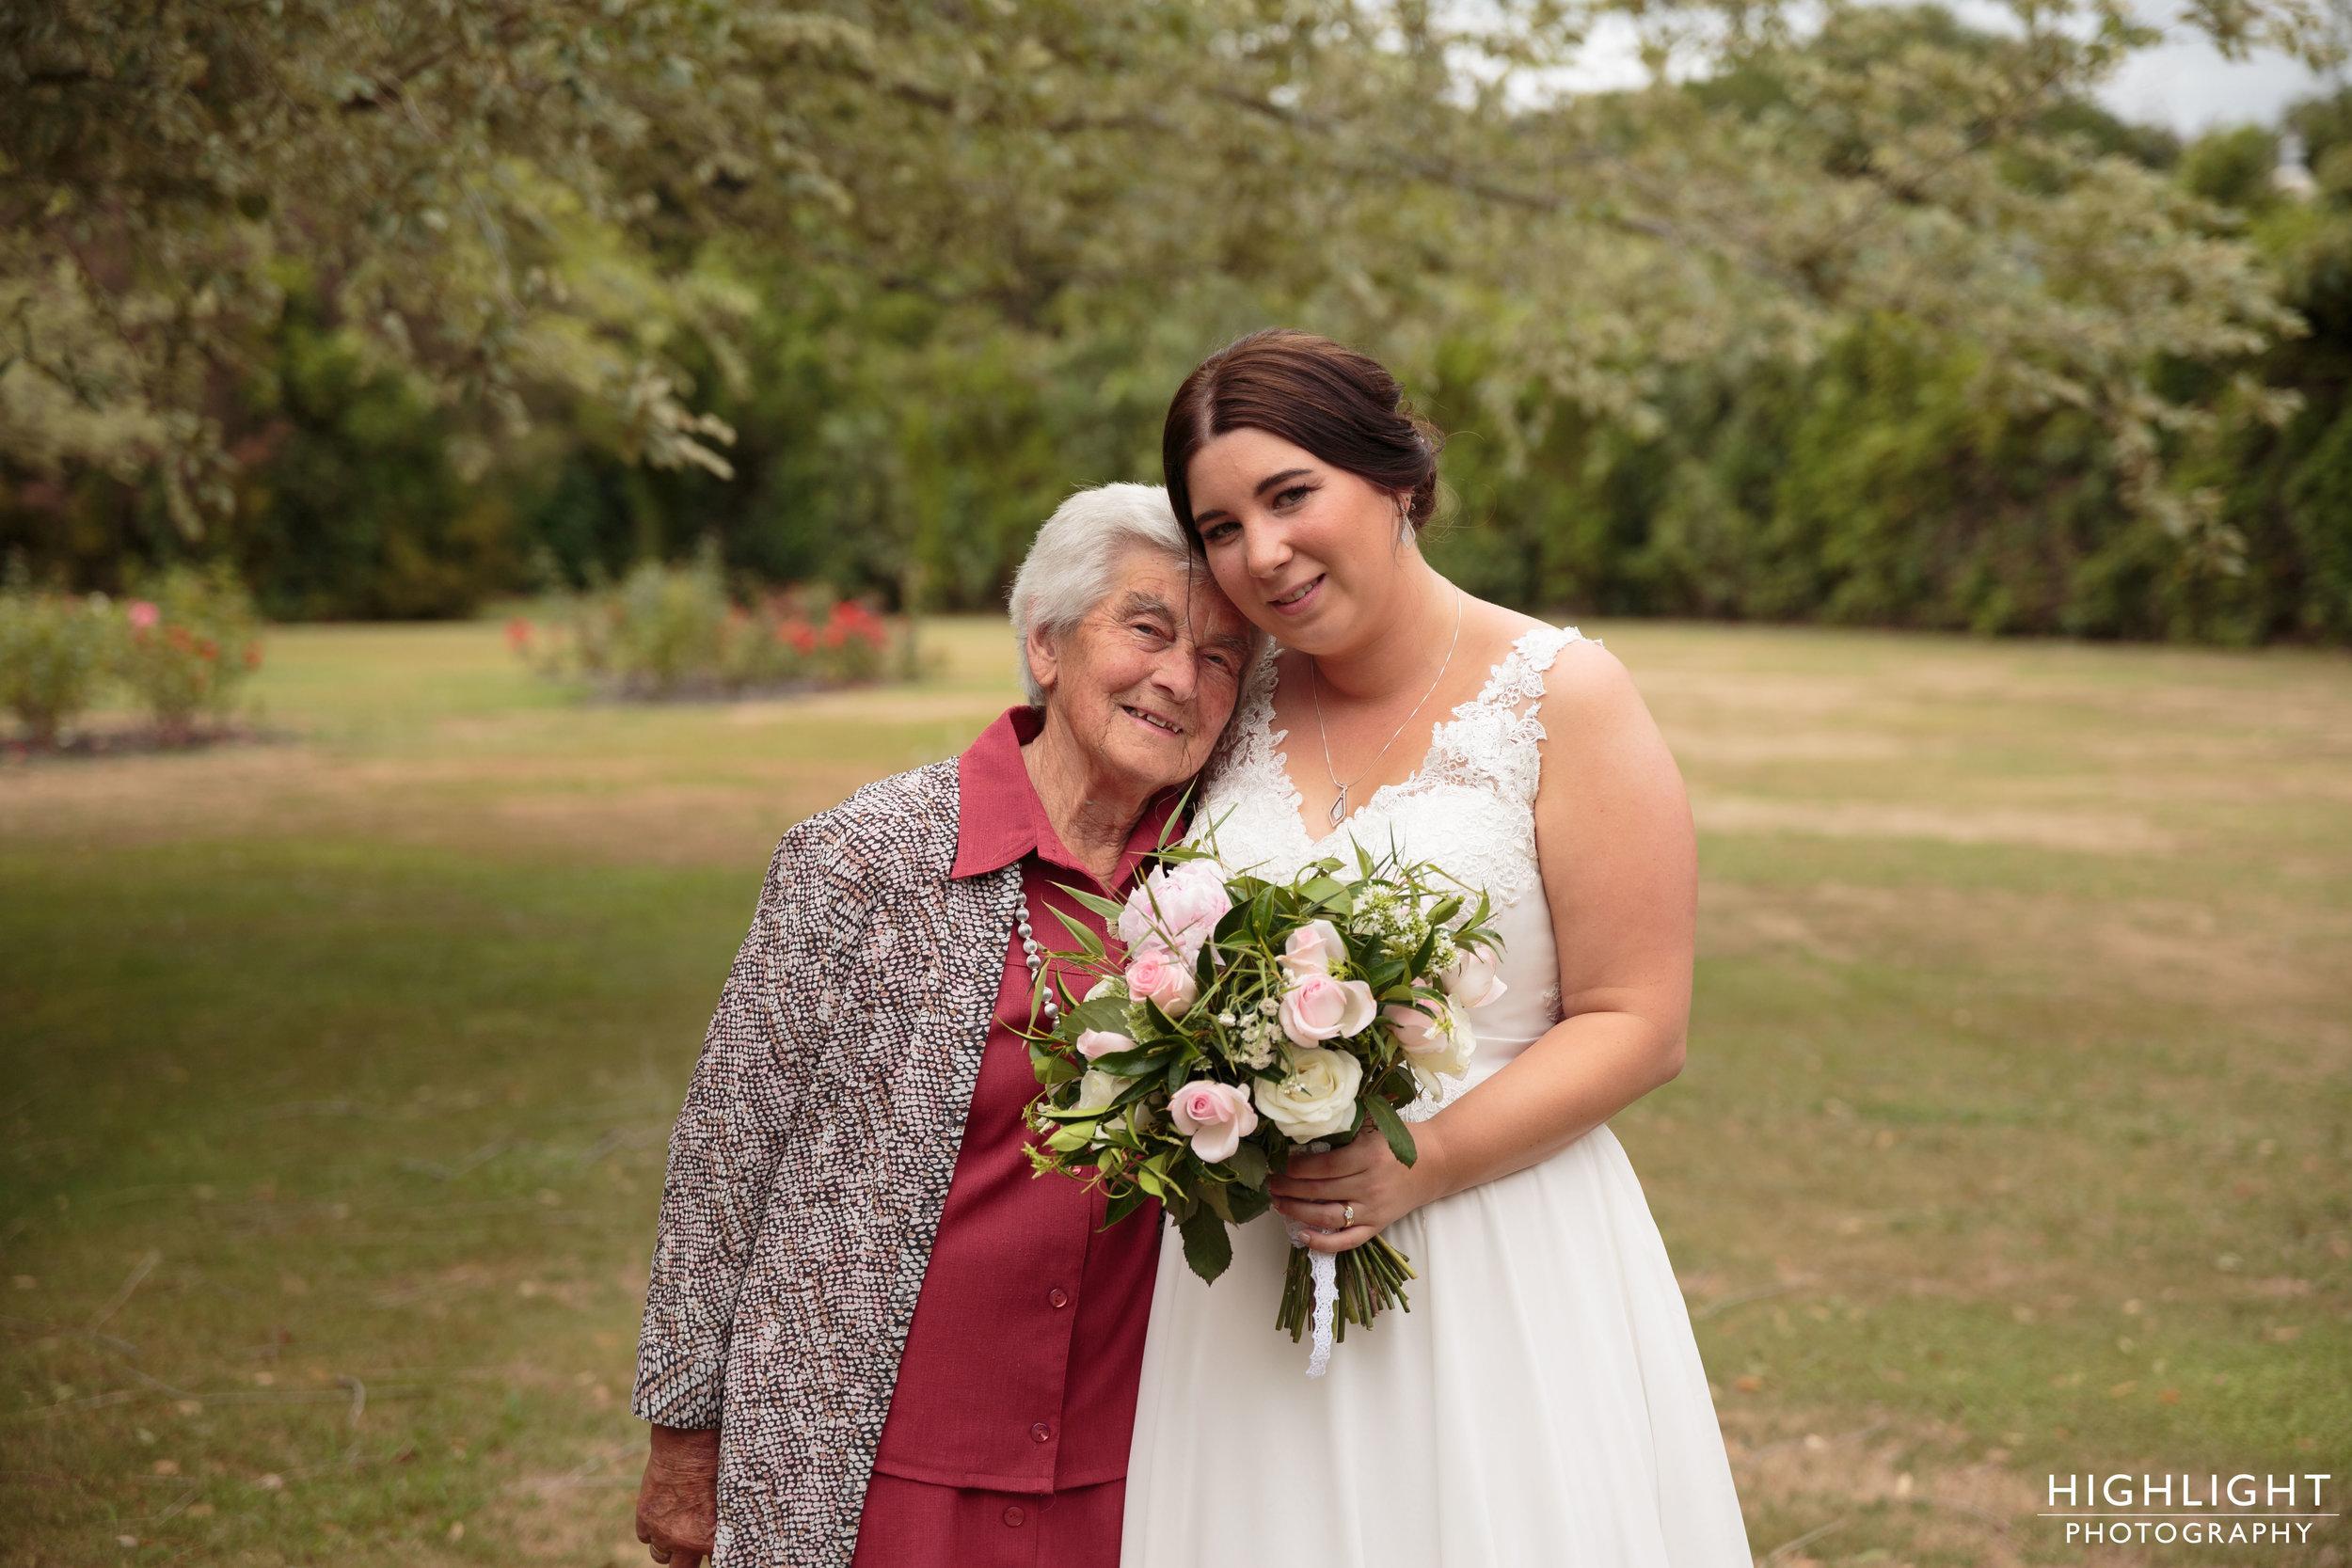 JM-2017-Highlight-wedding-photography-palmerston-north-new-zealand-84.jpg